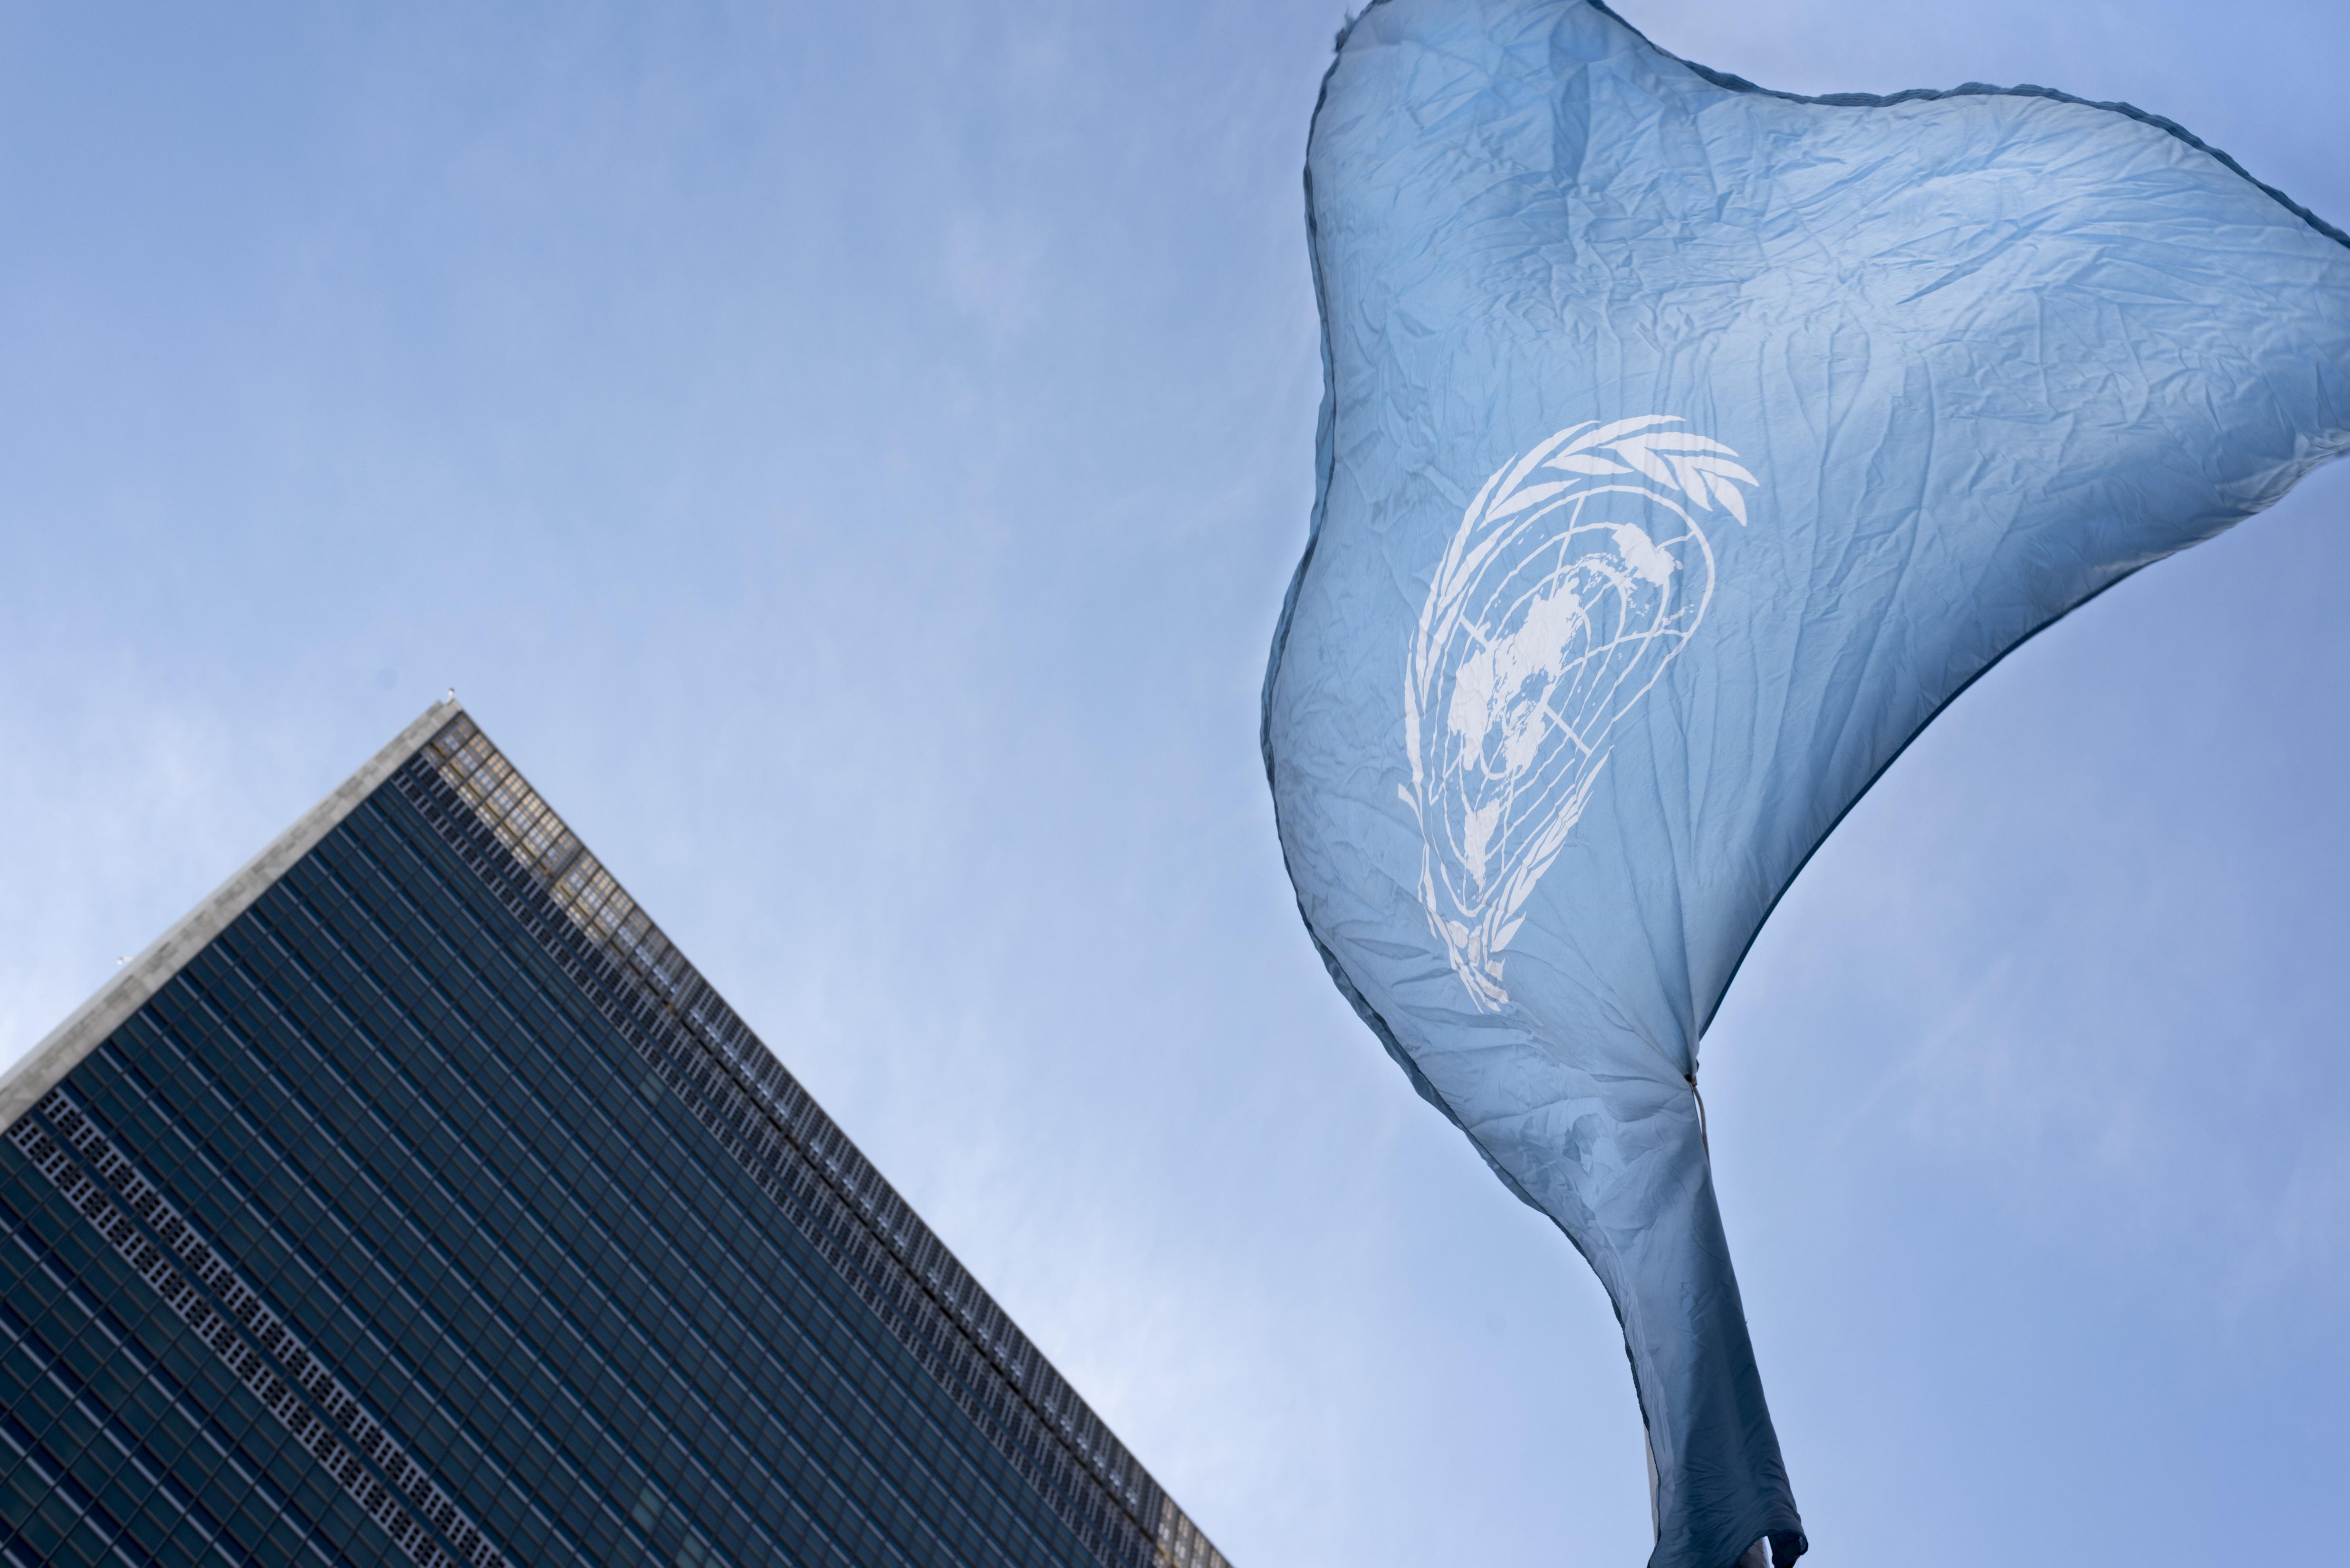 FN-flagget vaier på halv stang foran FN bygningen i New York